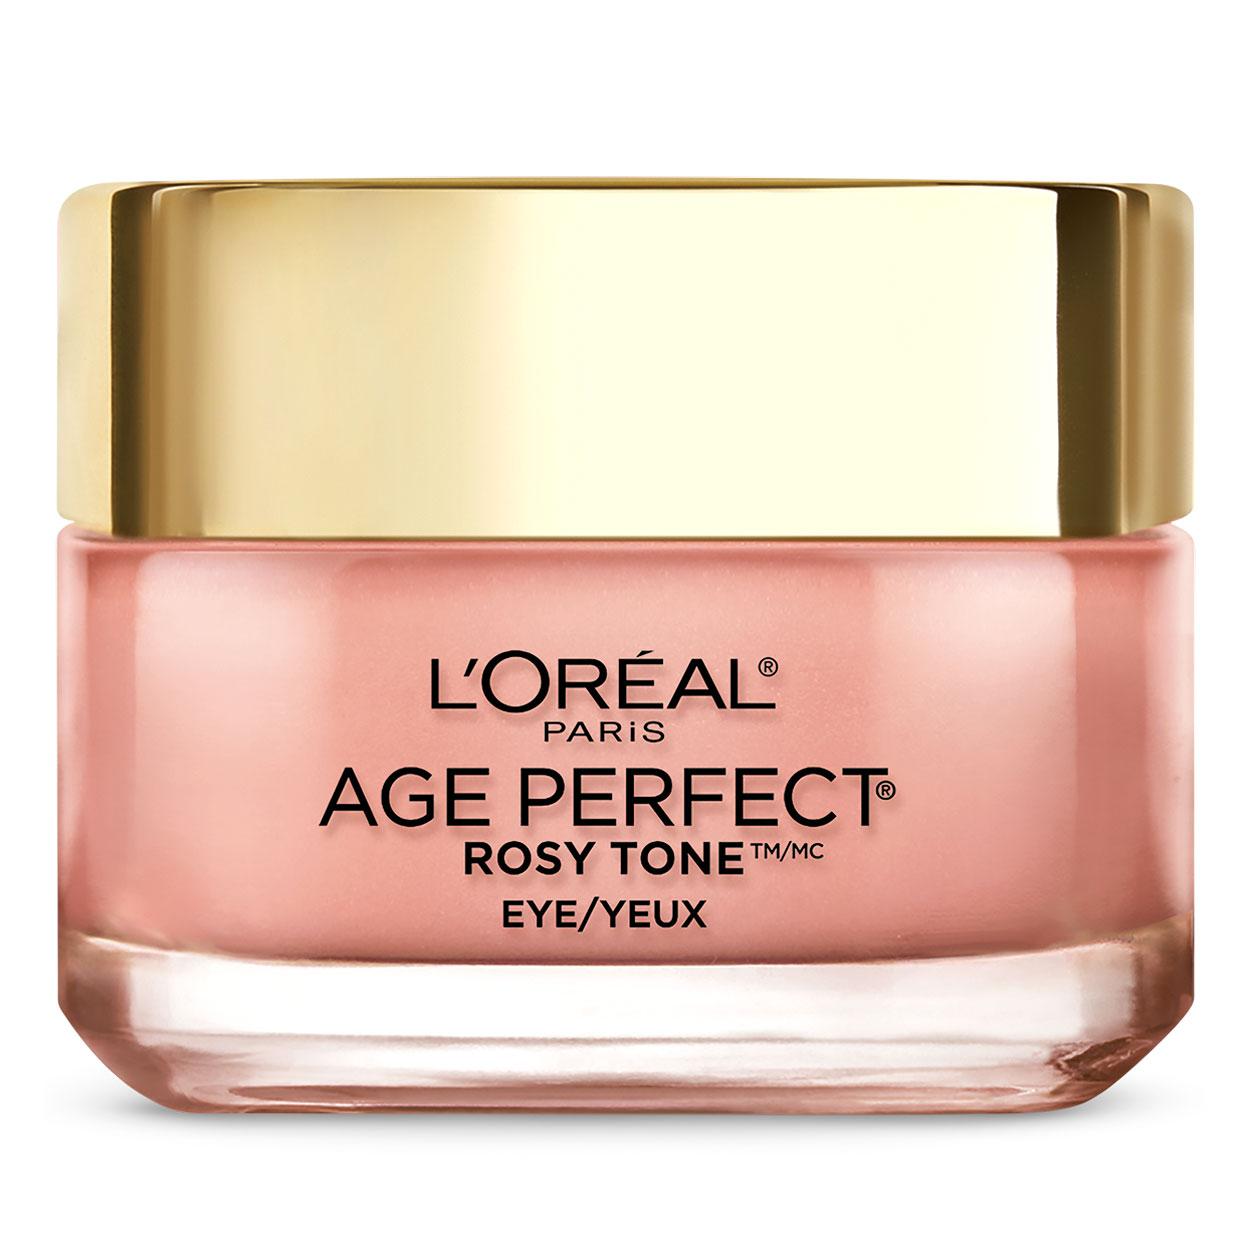 L'Oreal Paris Age Perfect Rosy Tone color correcting eye cream